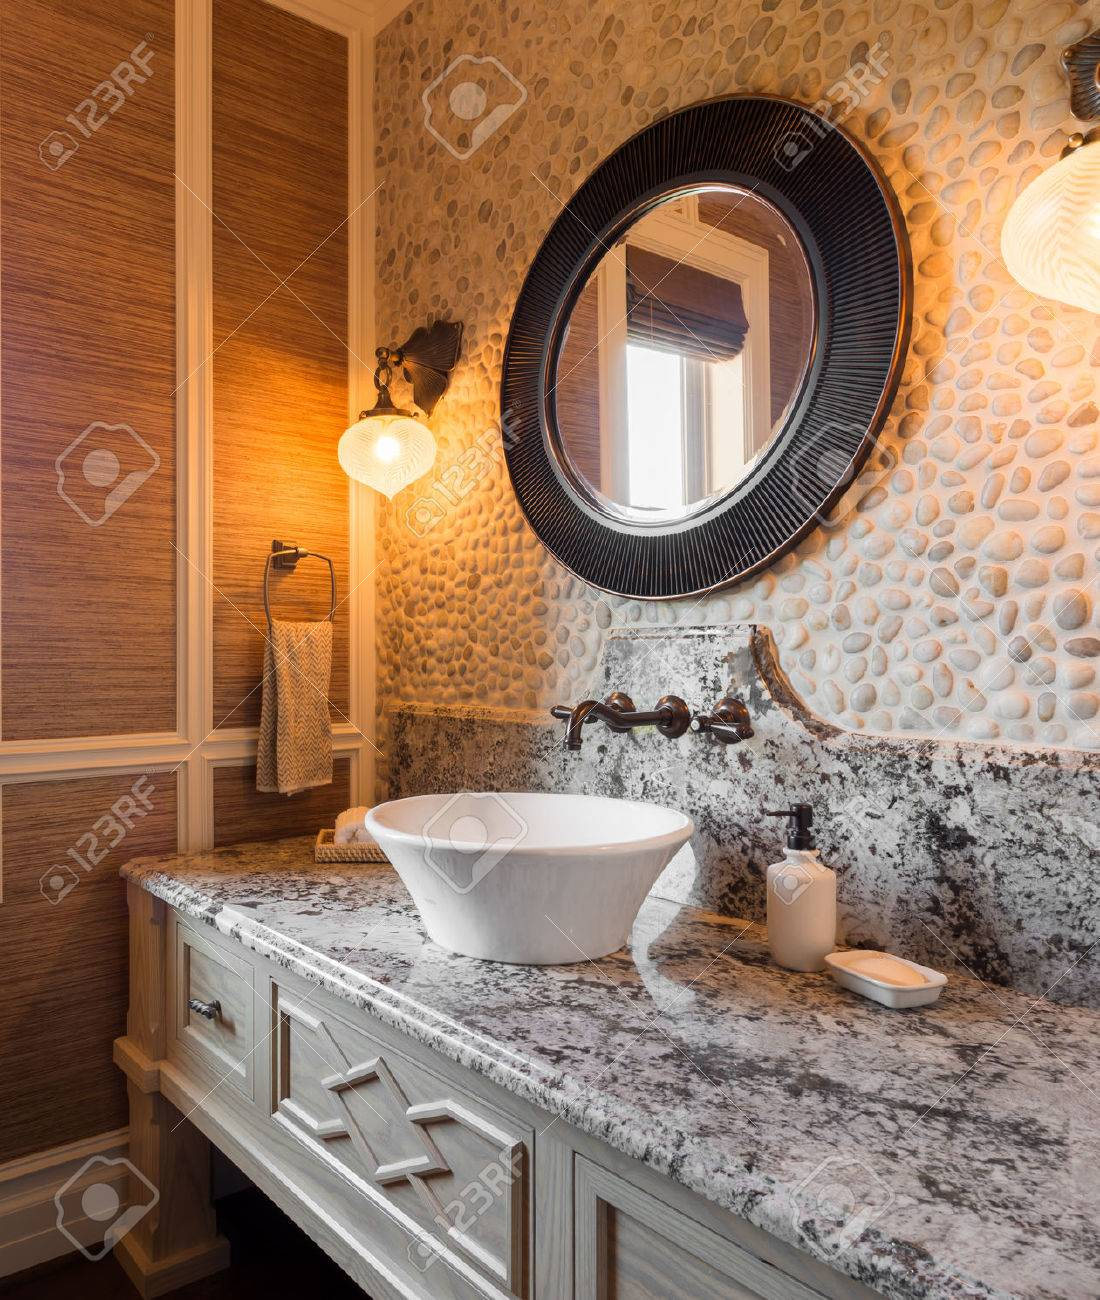 Luxury half bathrooms - Stock Photo Bathroom Interior In New Luxury Home Half Bath With Sink Counter And Mirror